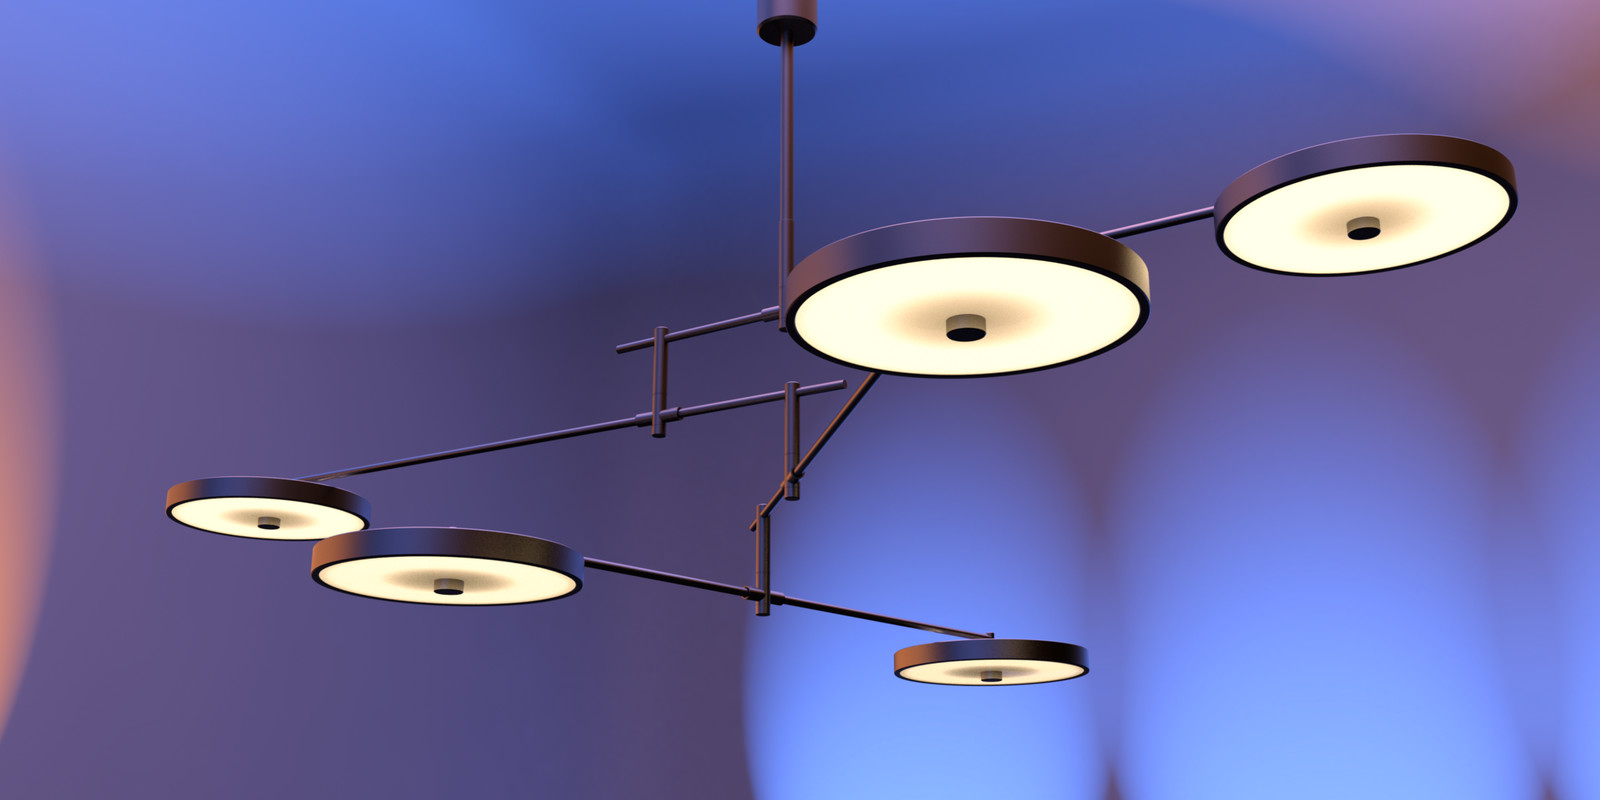 SketchUp + Thea Render Holly Hunt Lamp by DK detail 04